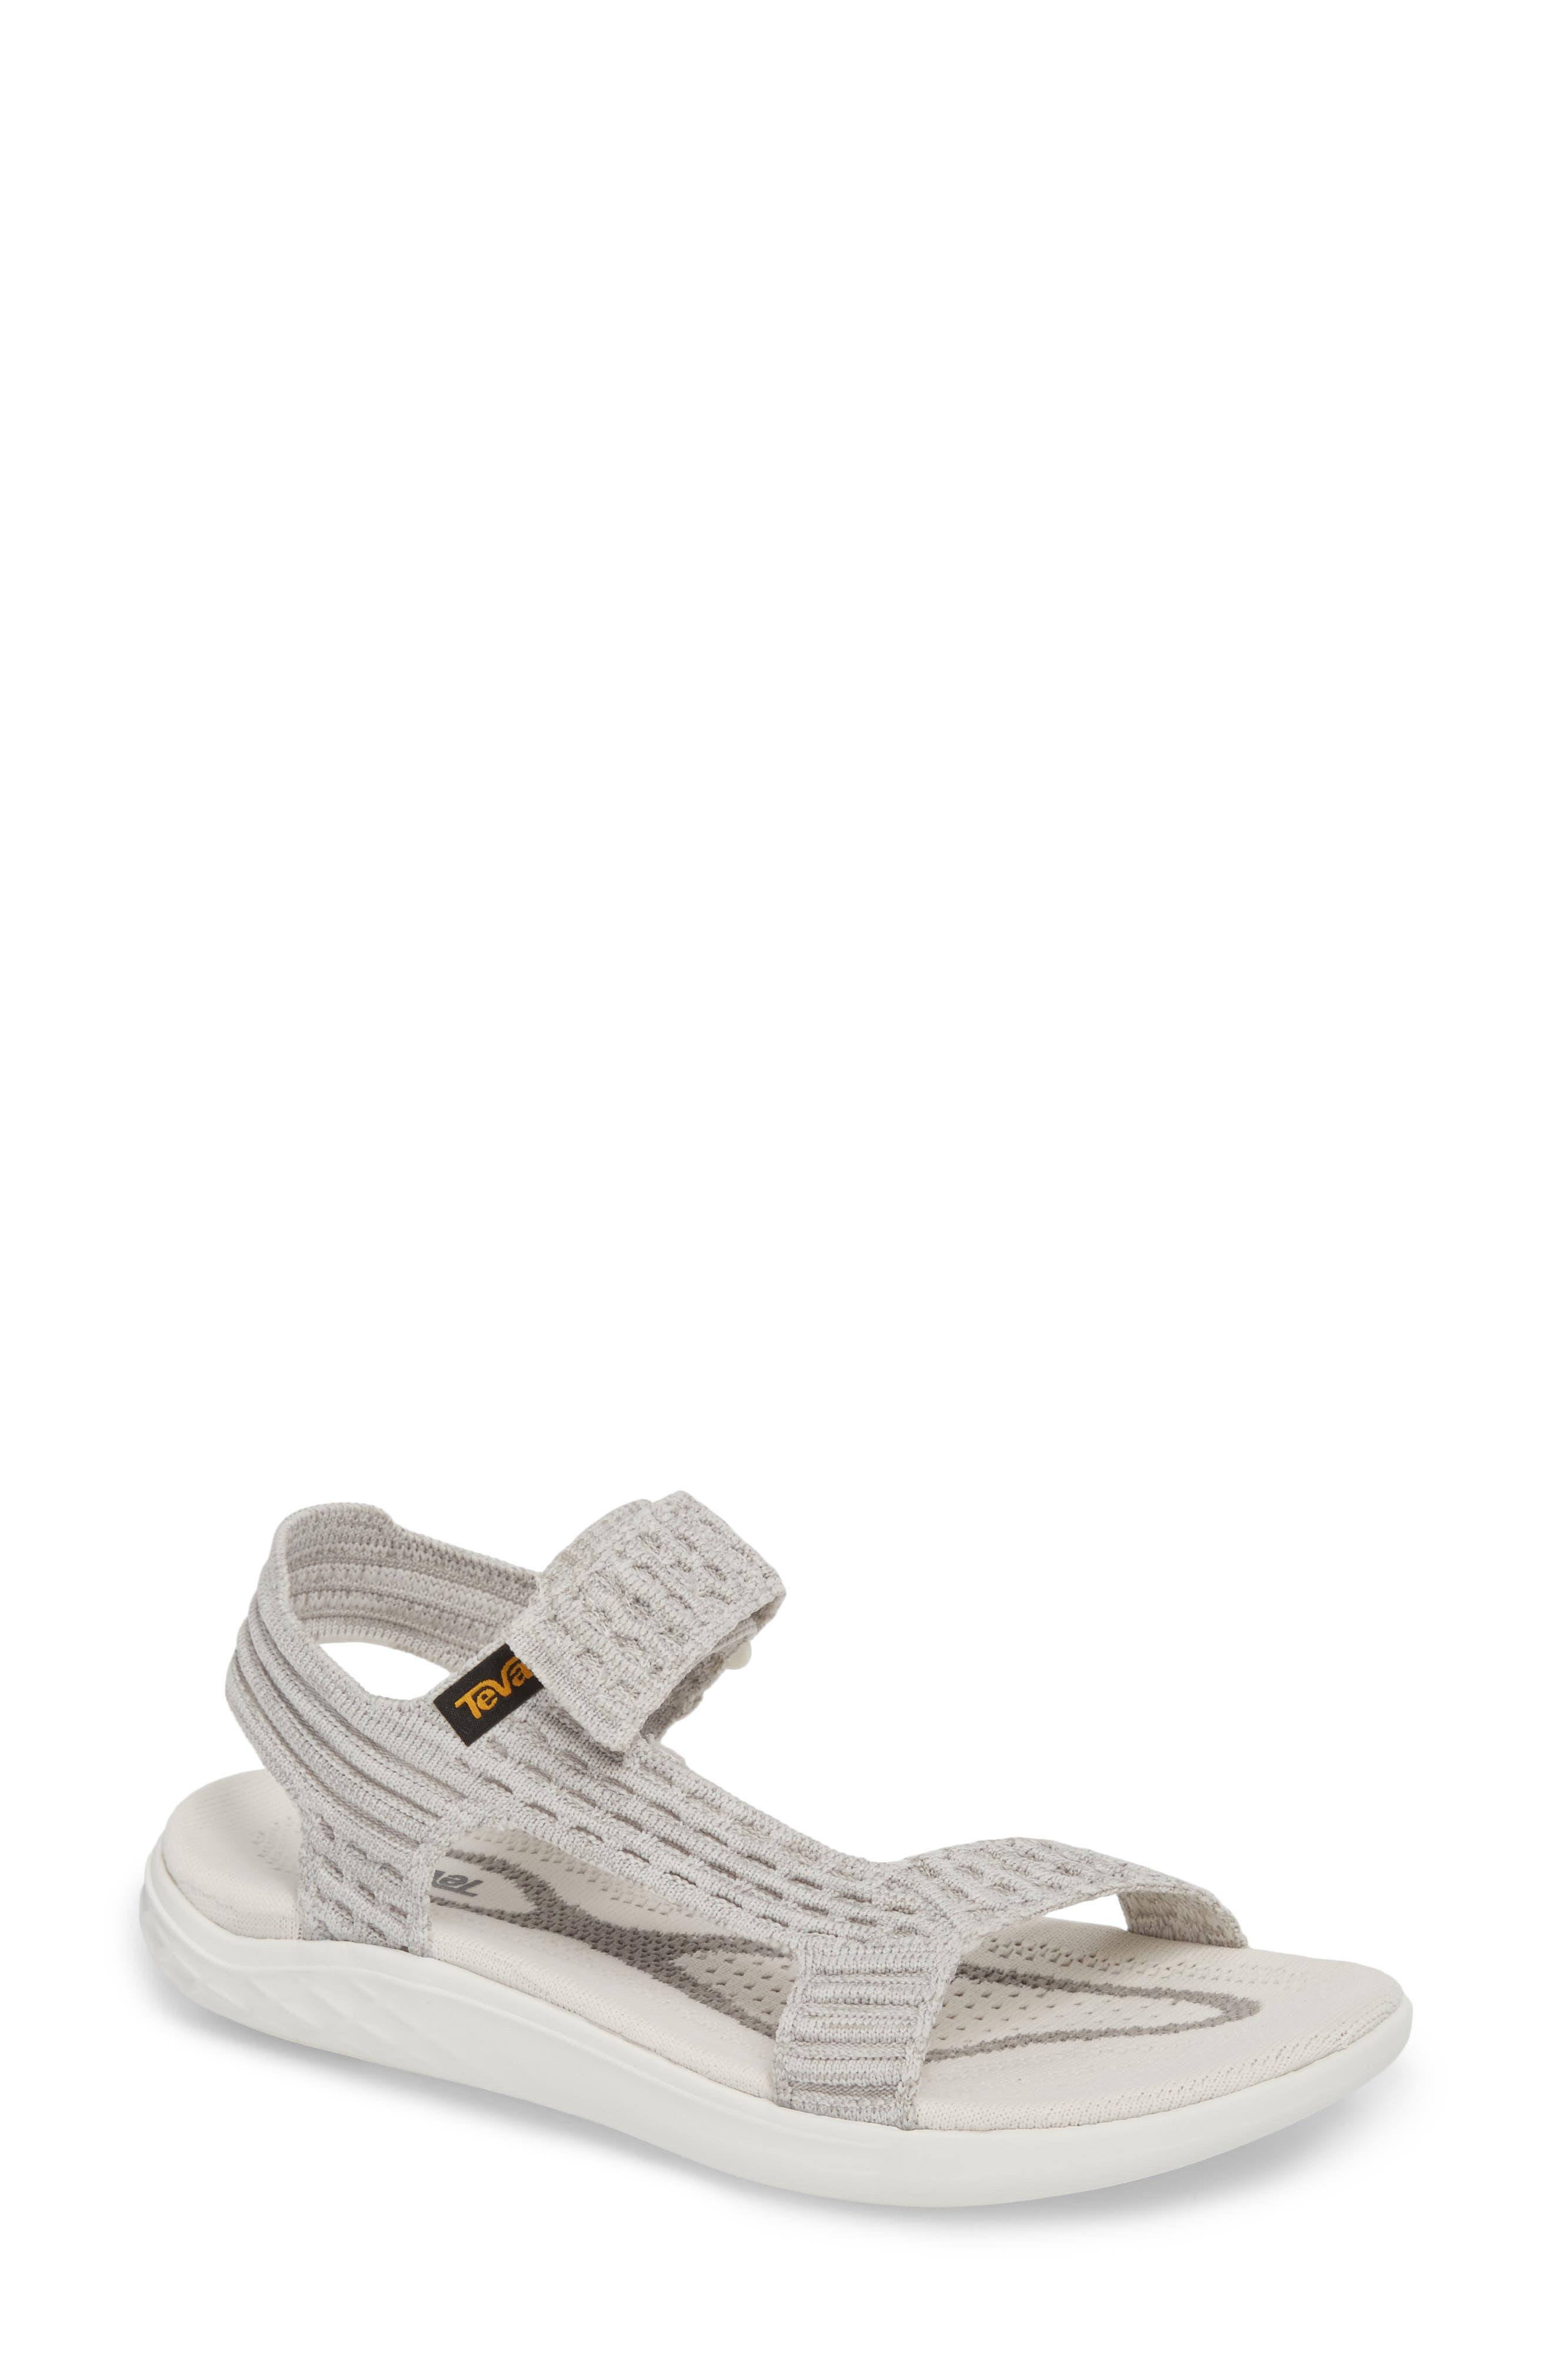 Terra Float 2 Knit Universal Sandal,                         Main,                         color, Bright White Fabric